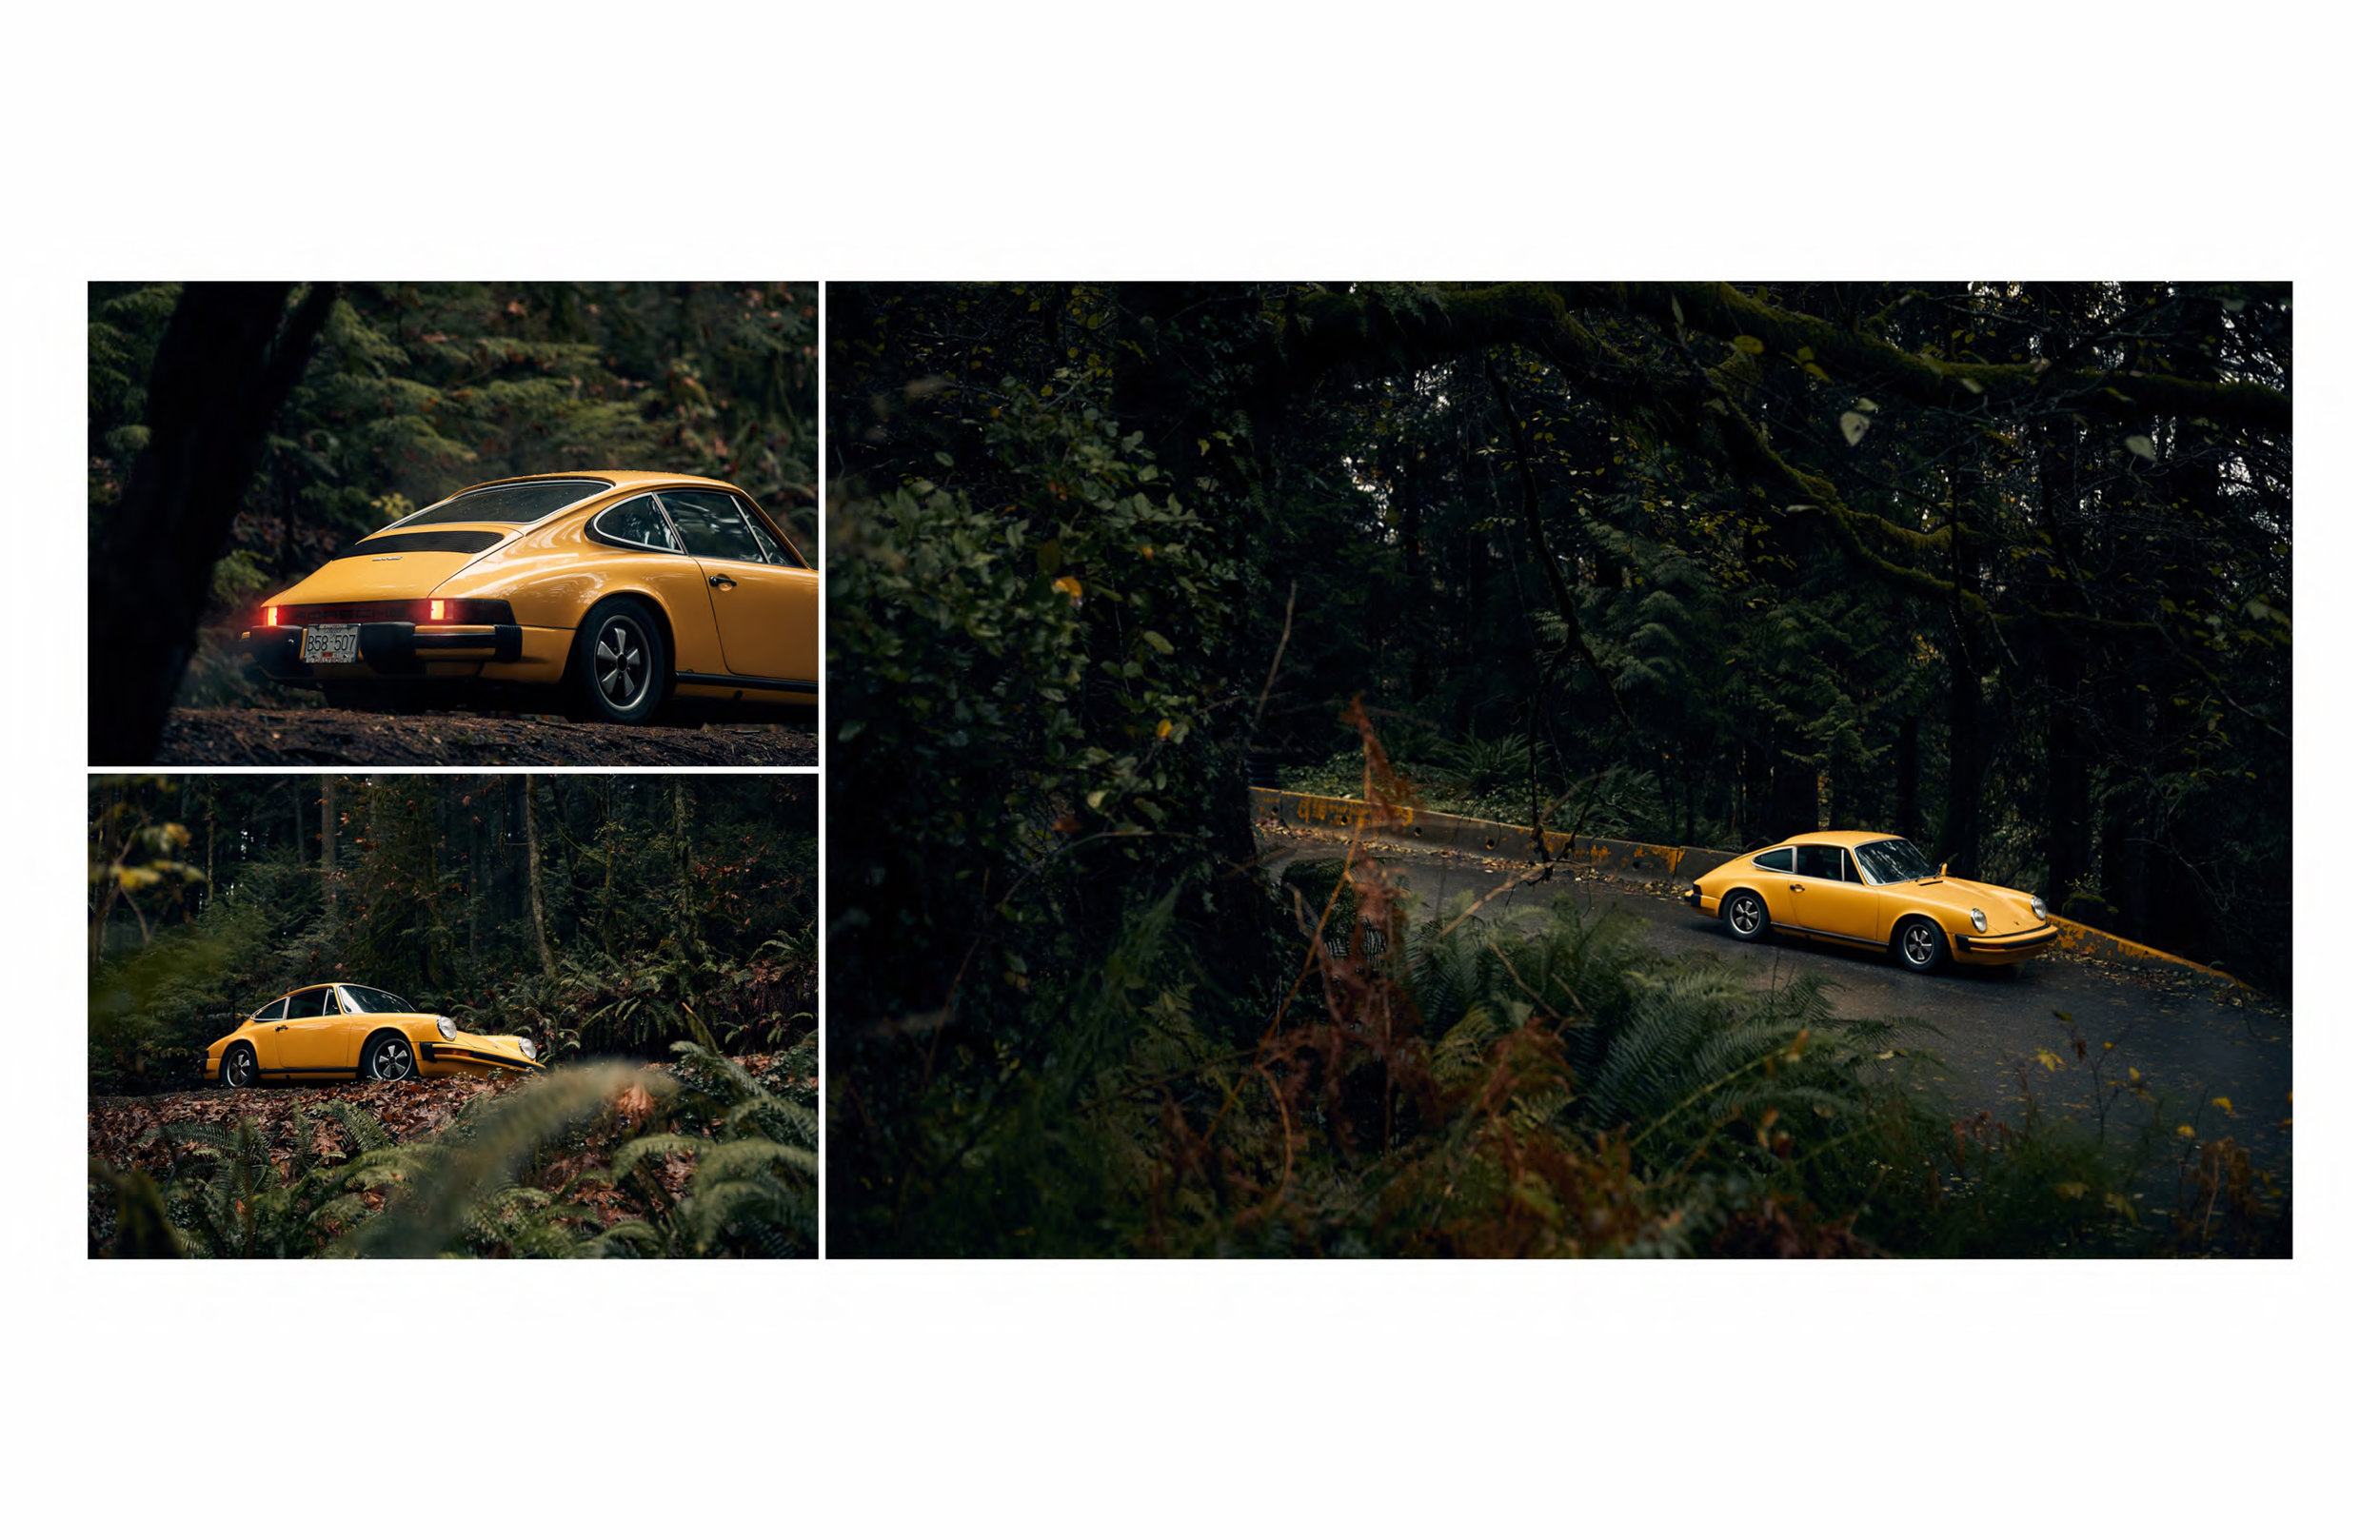 JackSchroederPhotographyTreatment-36.jpg